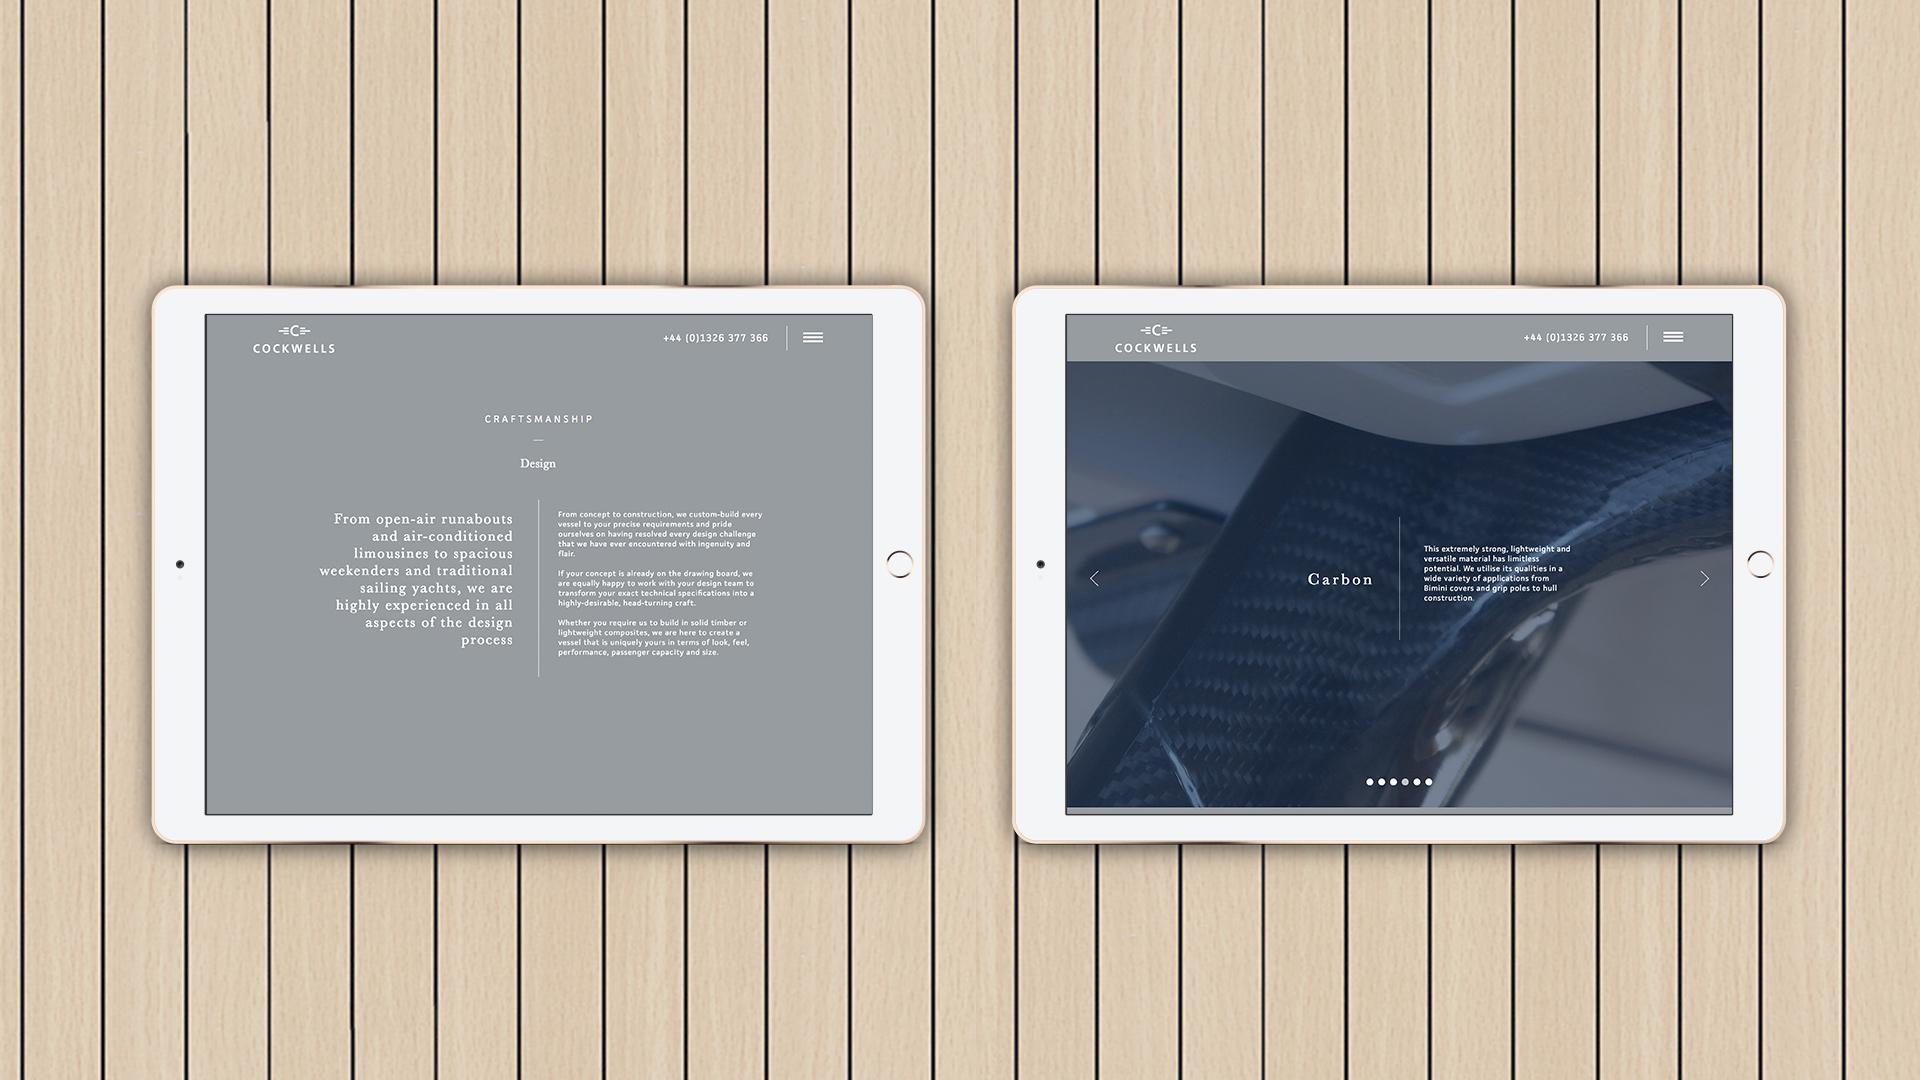 Cockwells Yachts | Creative Web Agency | Kingsland Linassi